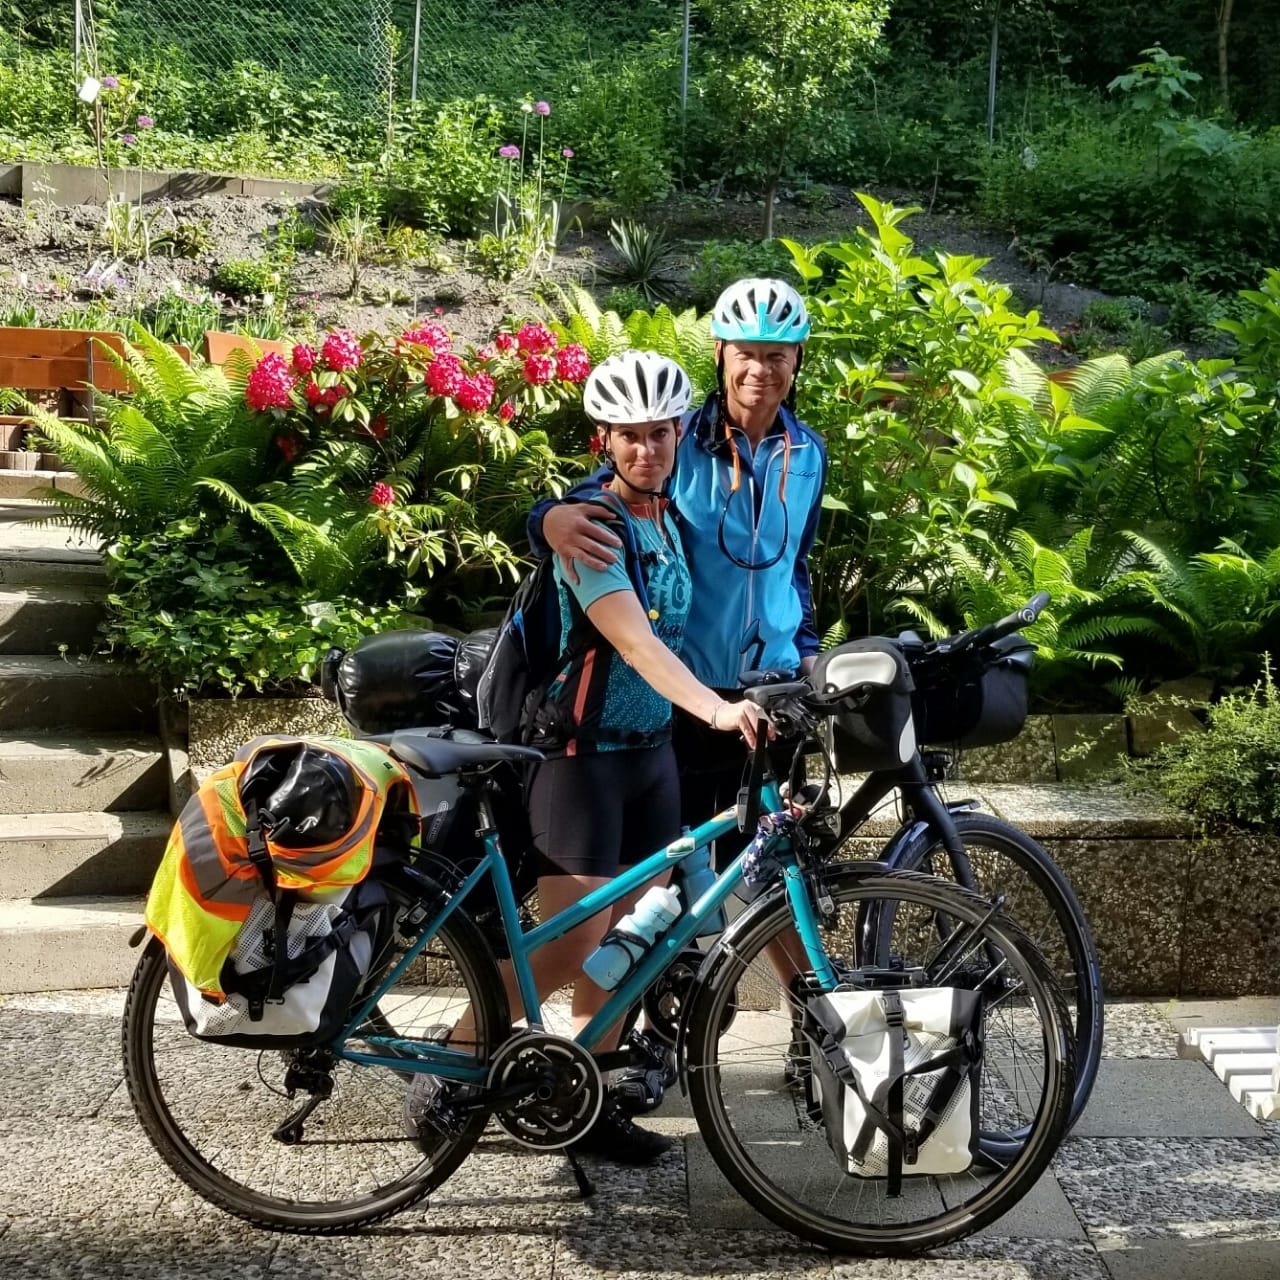 Auf Fahrradtour nach Mallorca: Kapitän Burgman und Freundin Nira Halfpap